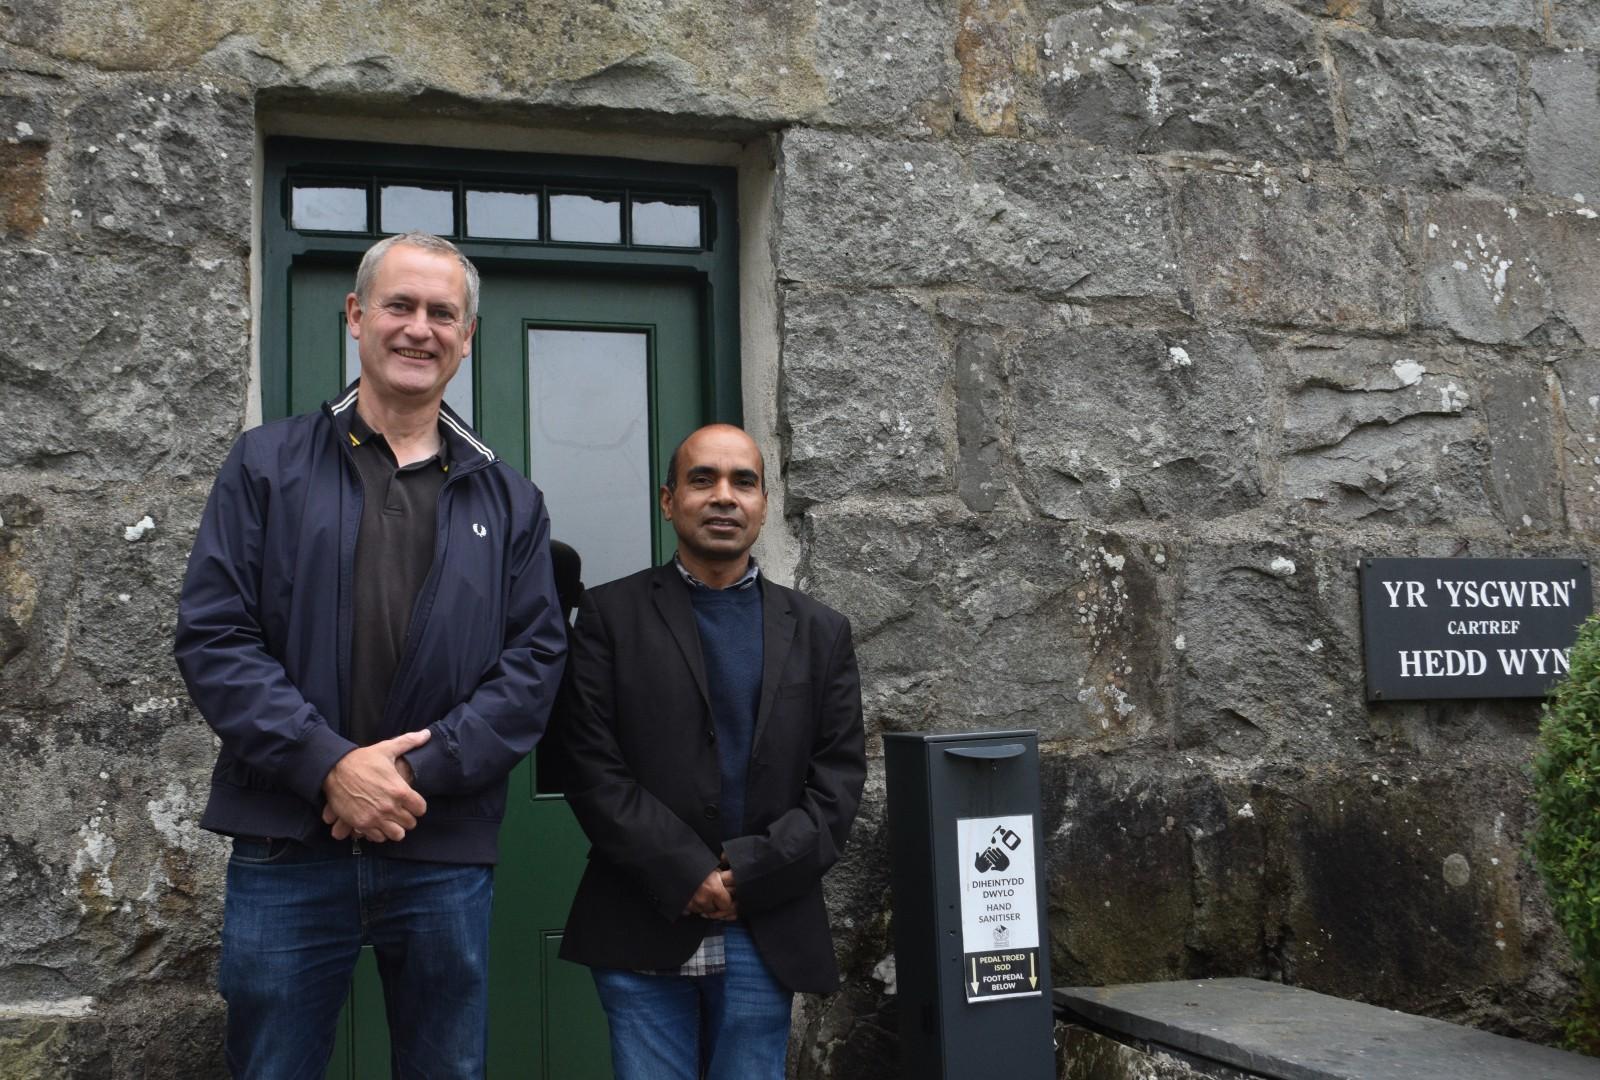 Anisur meets National Poet of Wales, Ifor ap Glyn